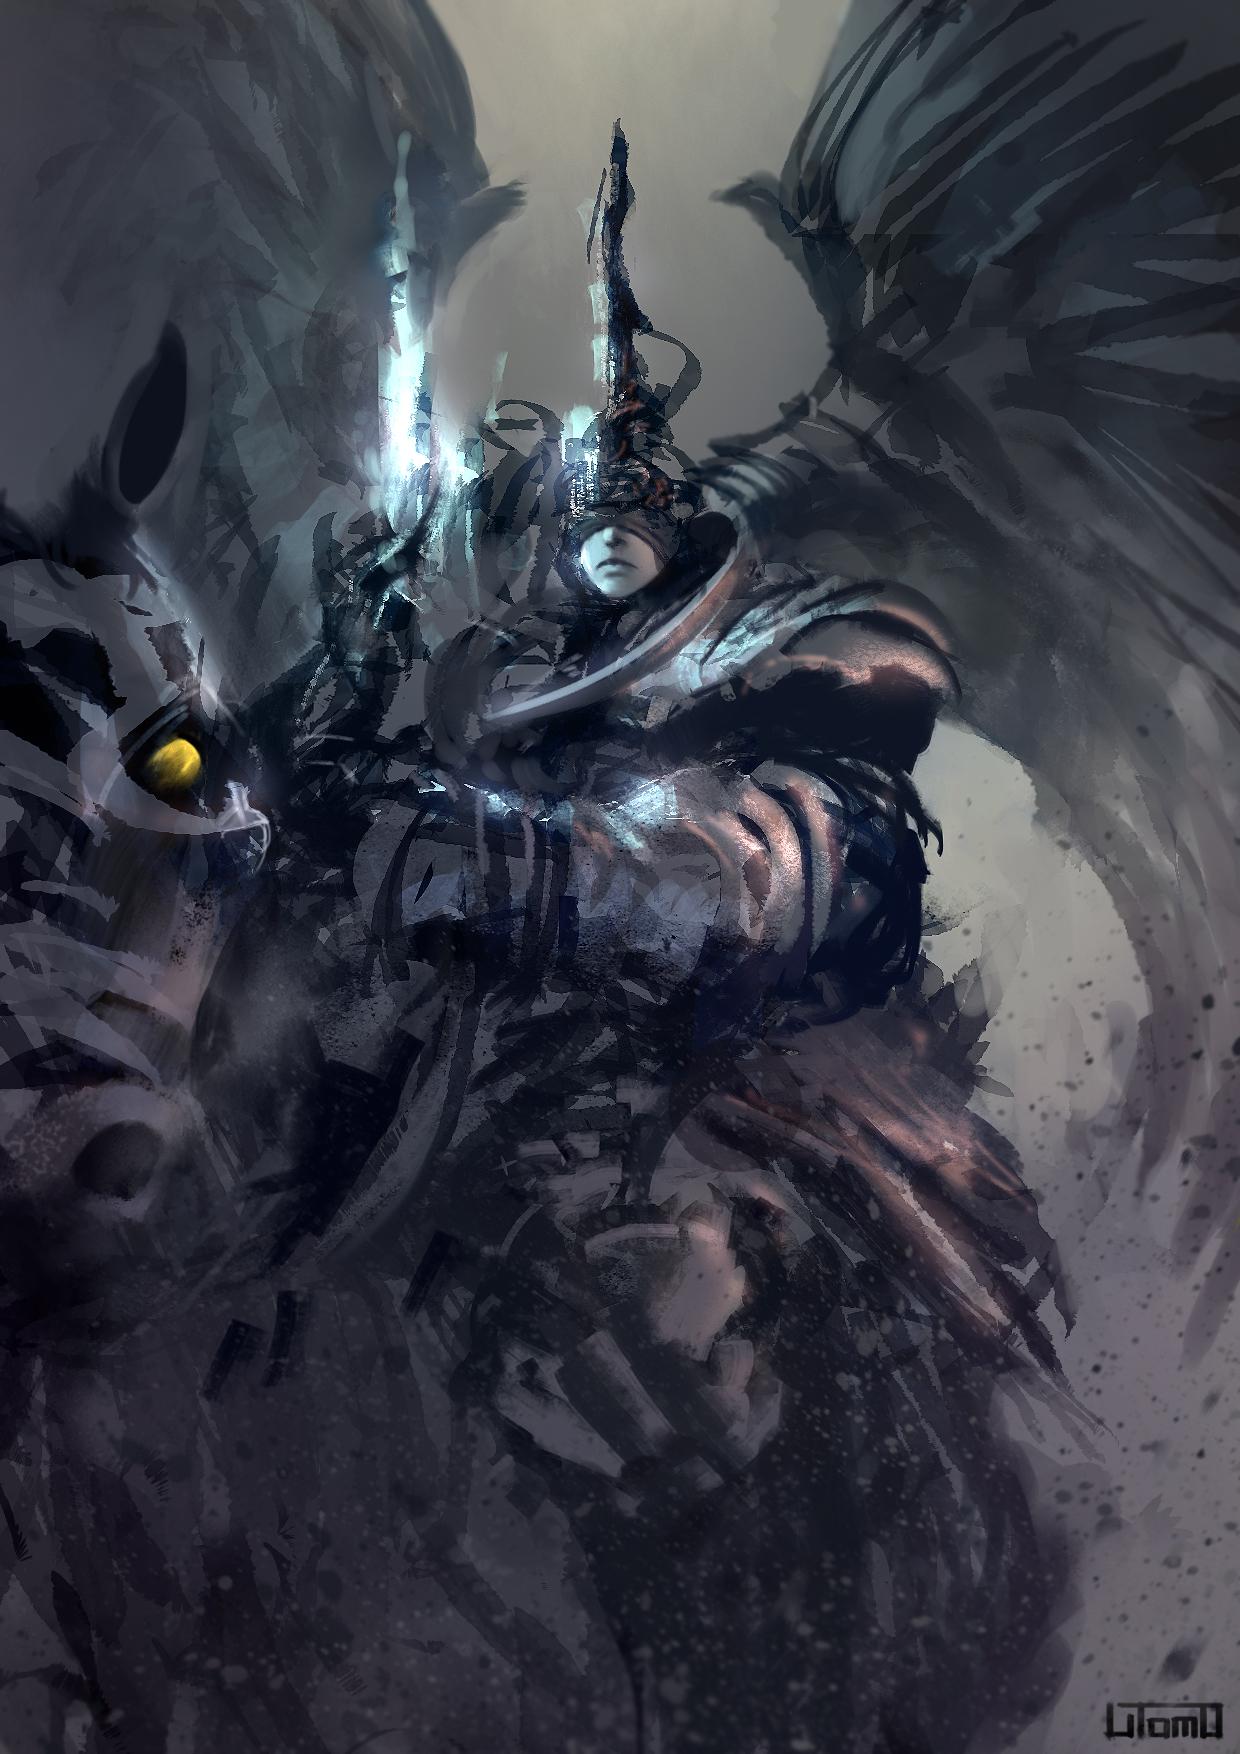 Dark Angel Rider by Juhupainting on DeviantArt